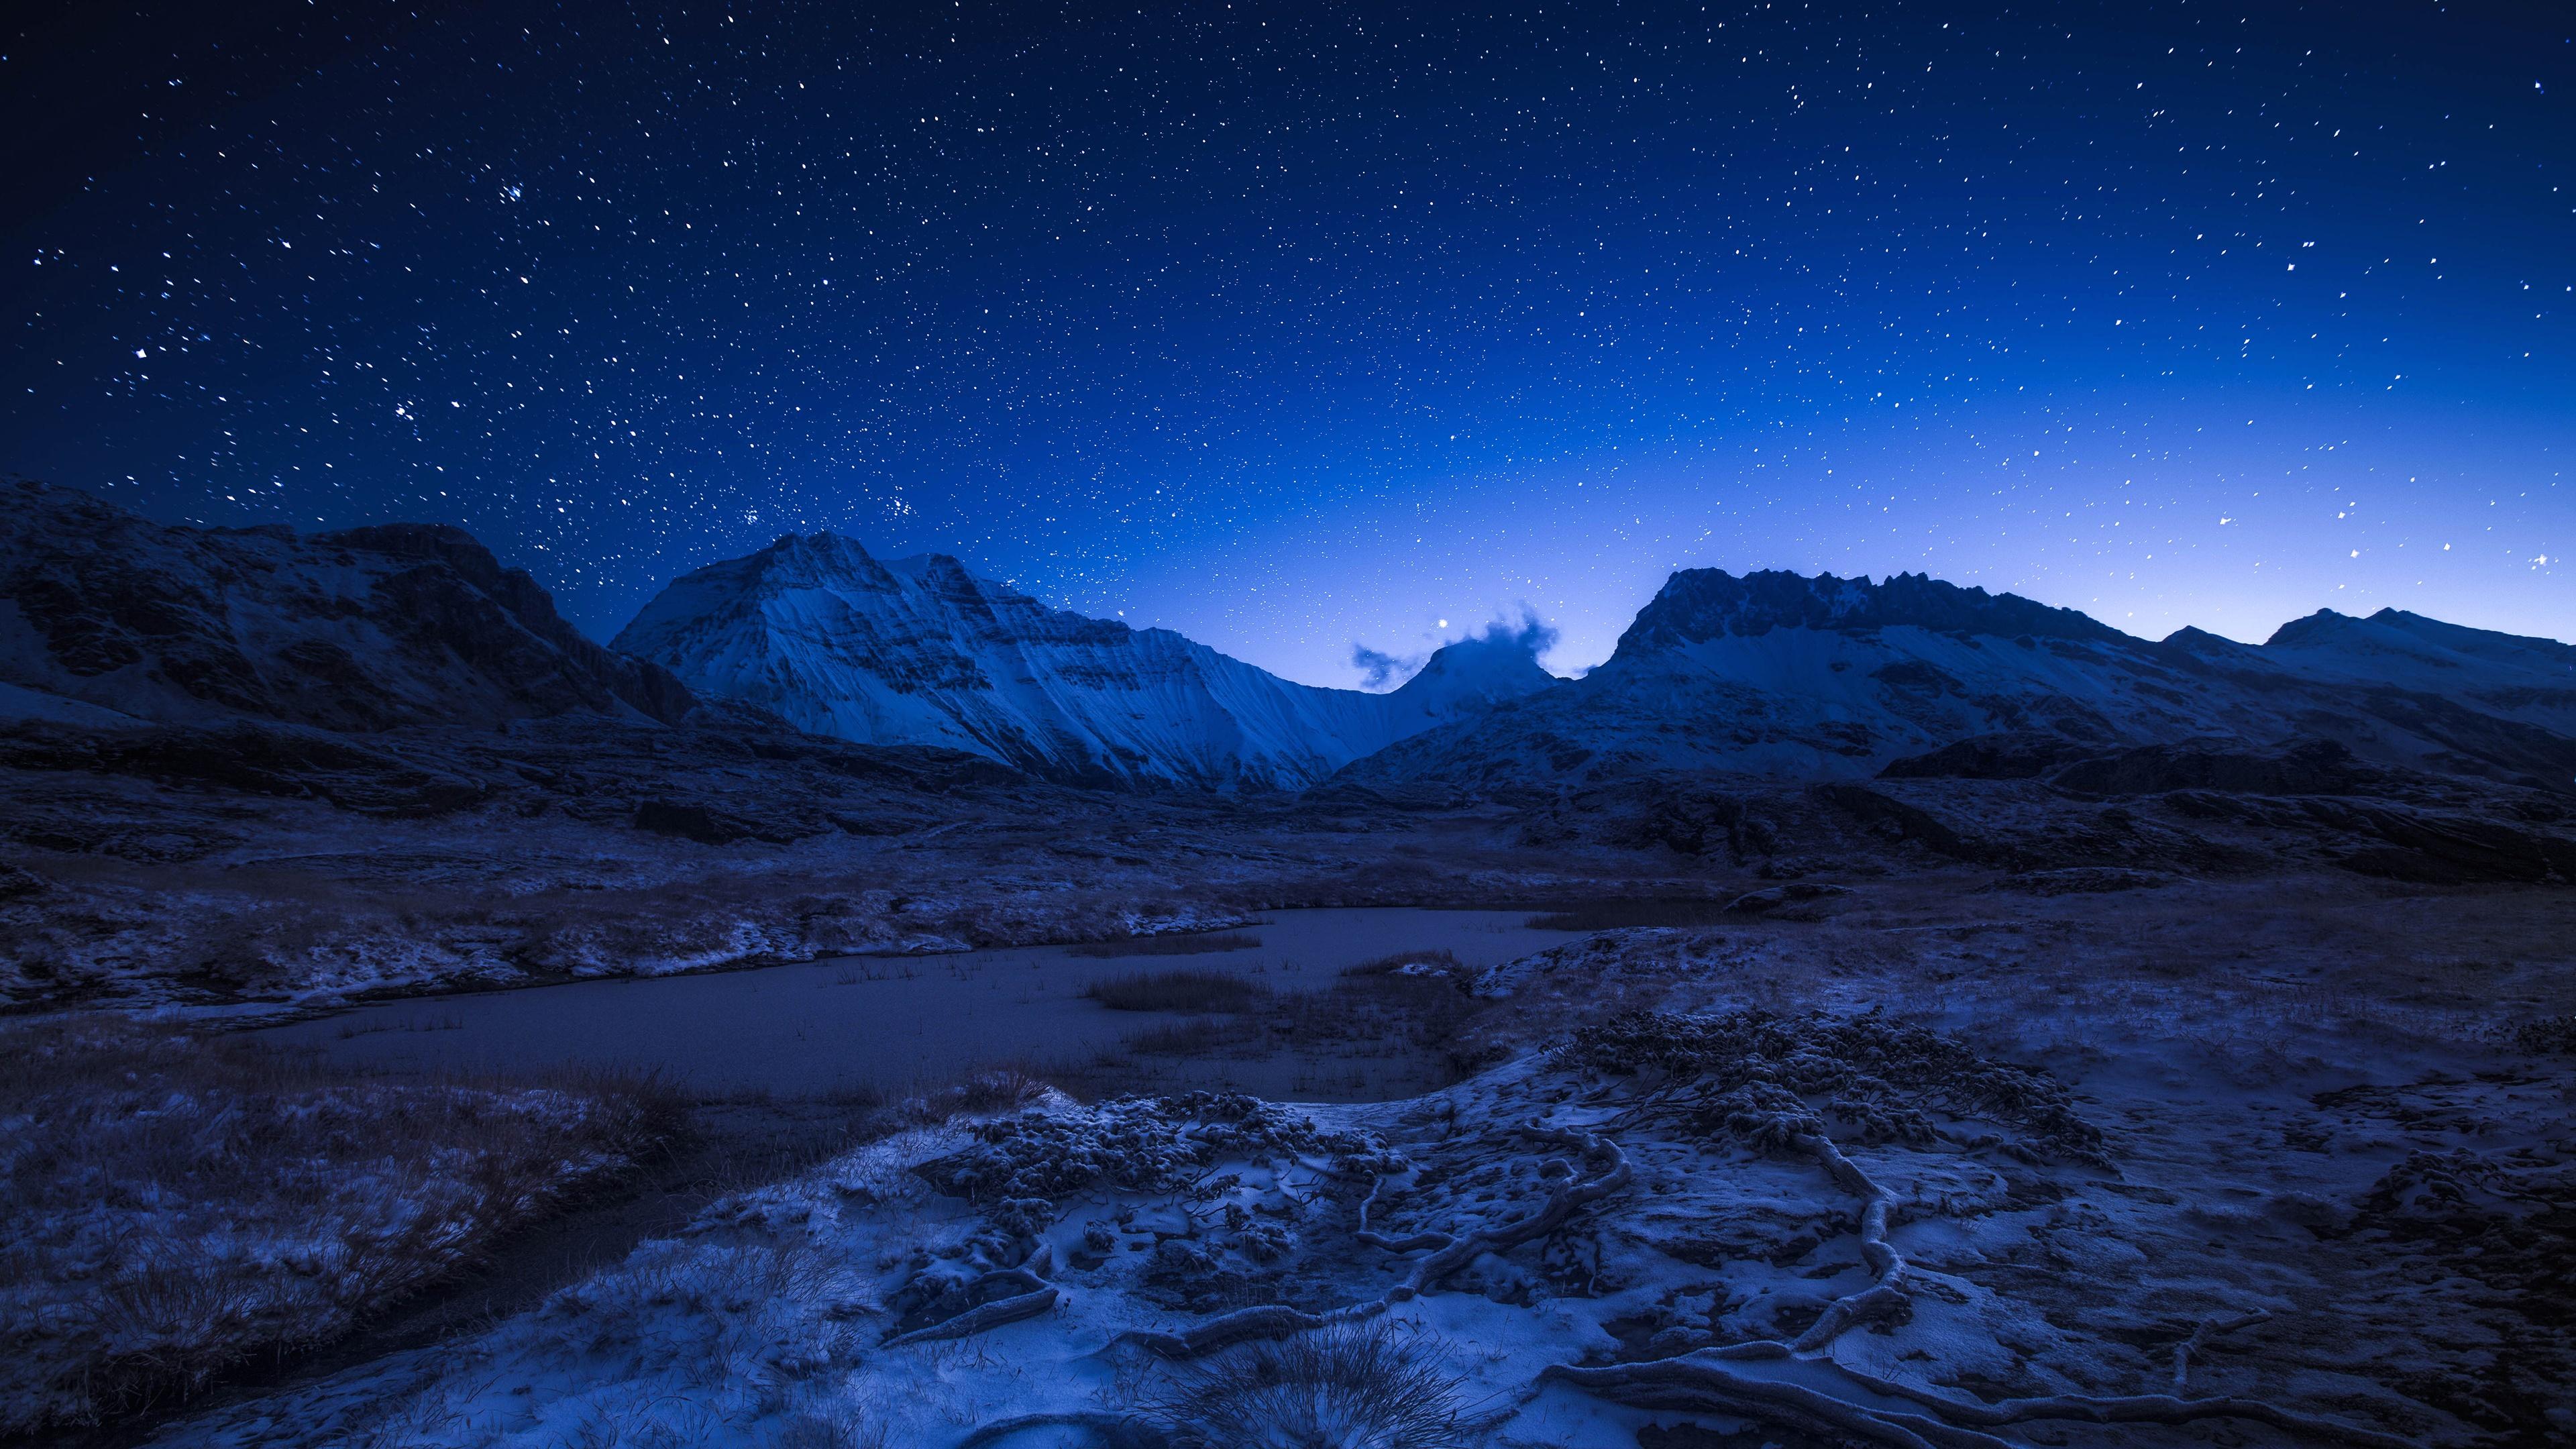 Starry night sky above the snowy mountains 4k ultrahd - Night mountain wallpaper 4k ...